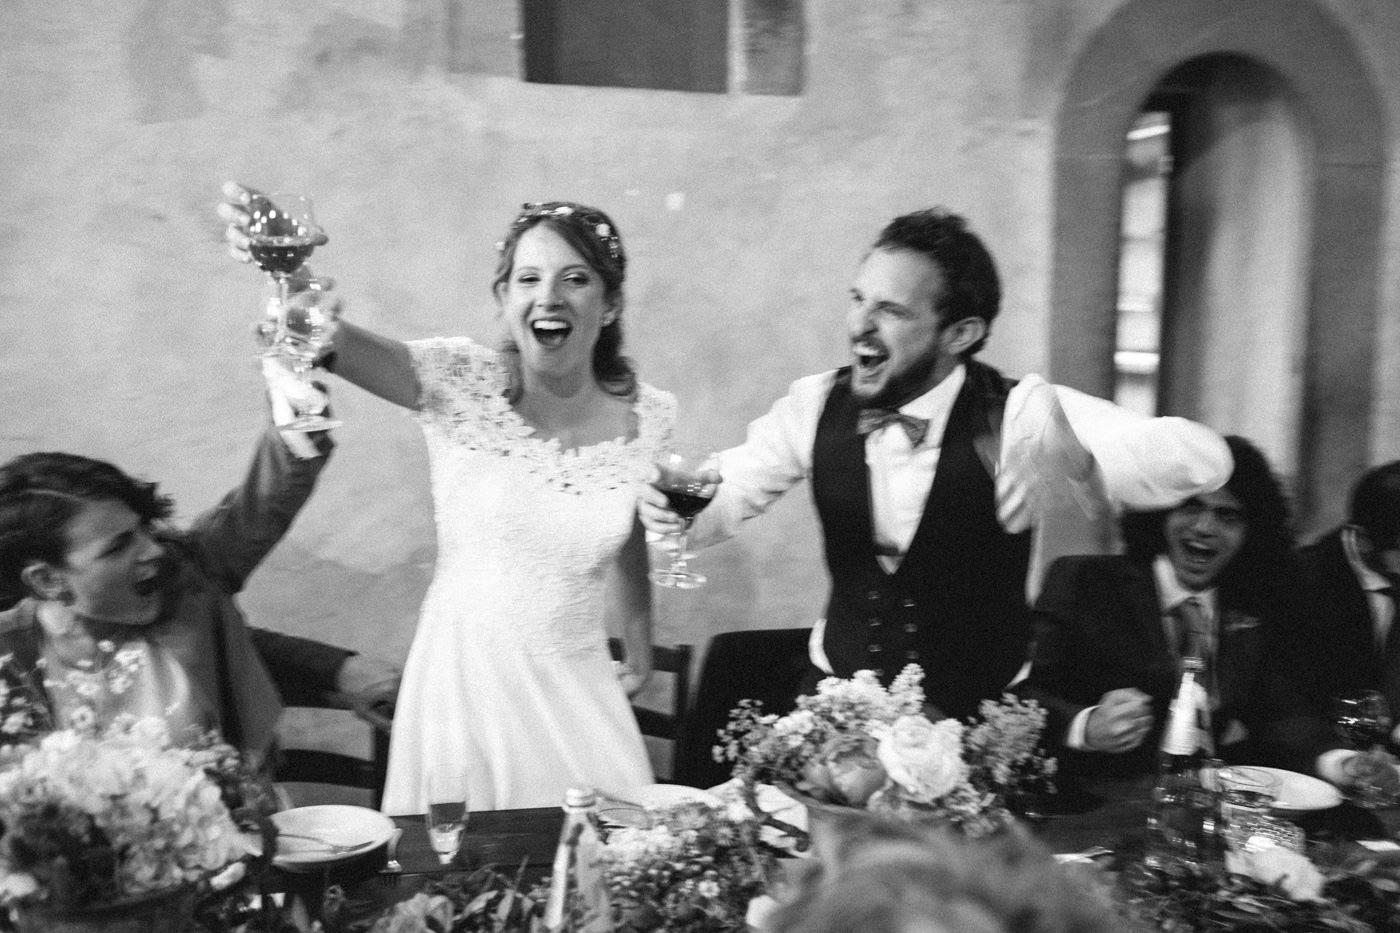 matrimoni_all_italiana_fotografo_matrimonio_toscana-70.jpg